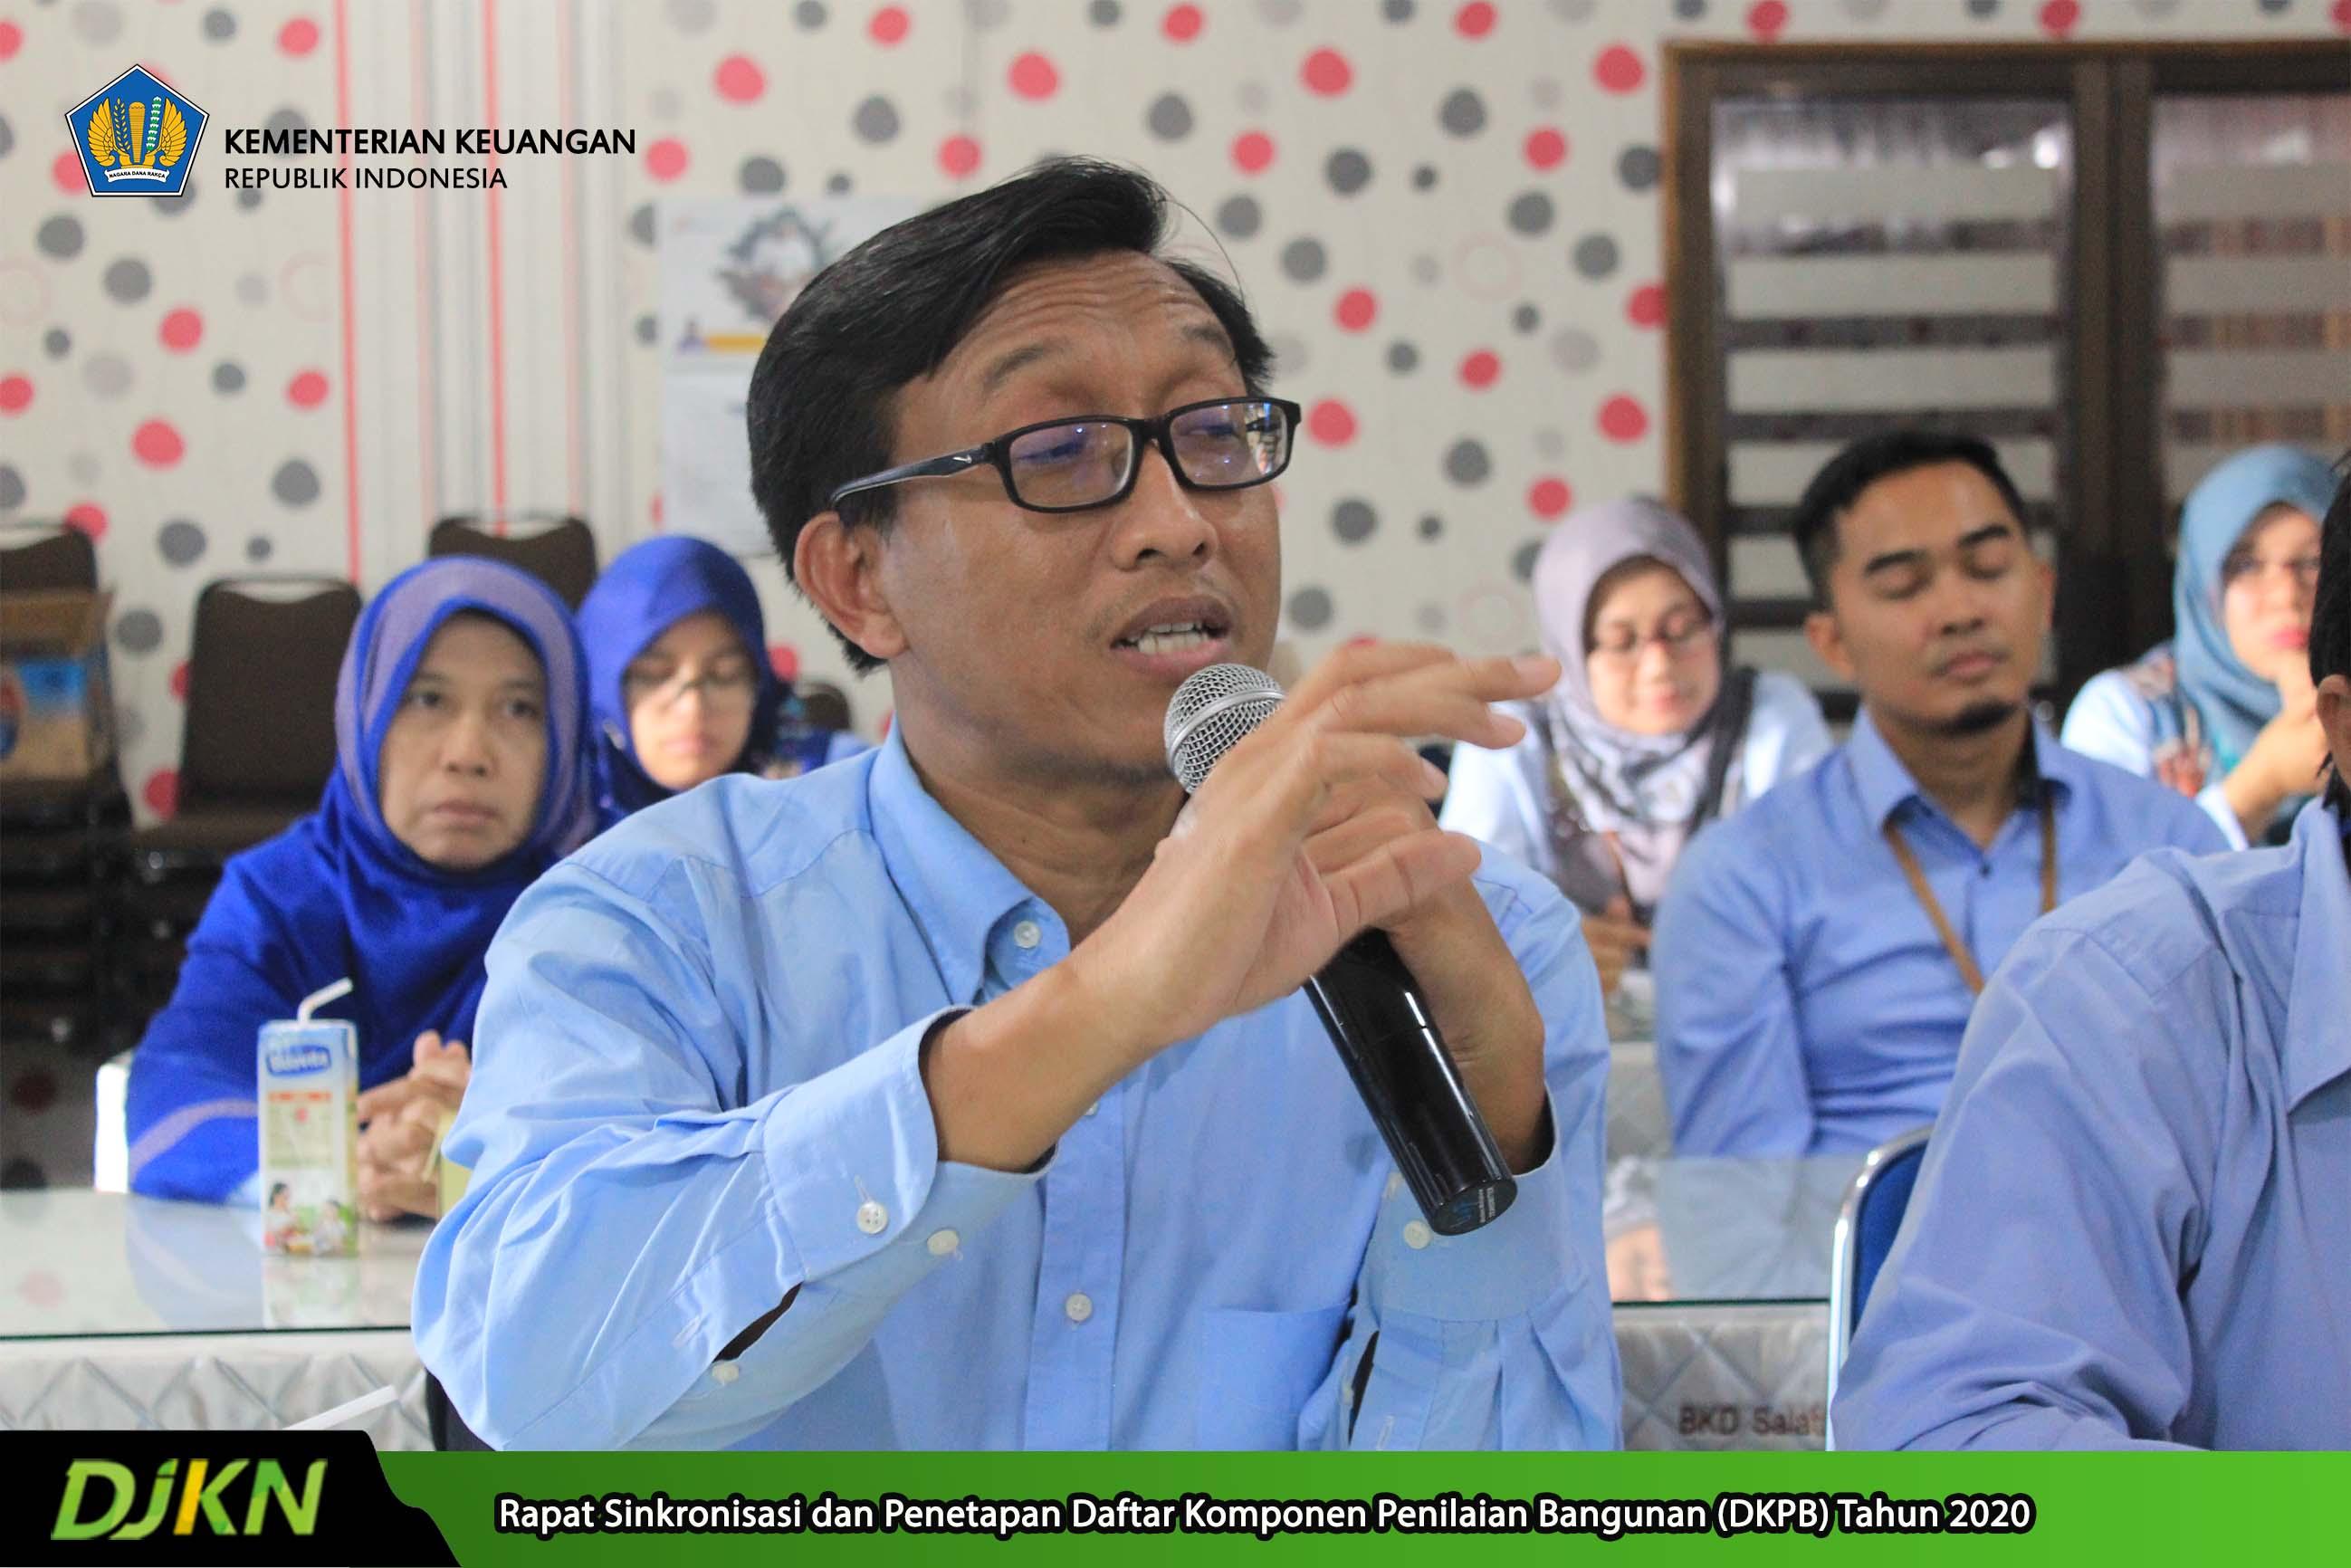 Pembukaan Rapat Sinkronisasi DKPB, Sekretaris BKD Salatiga: Banyak Tugas BKD Beririsan dengan DJKN